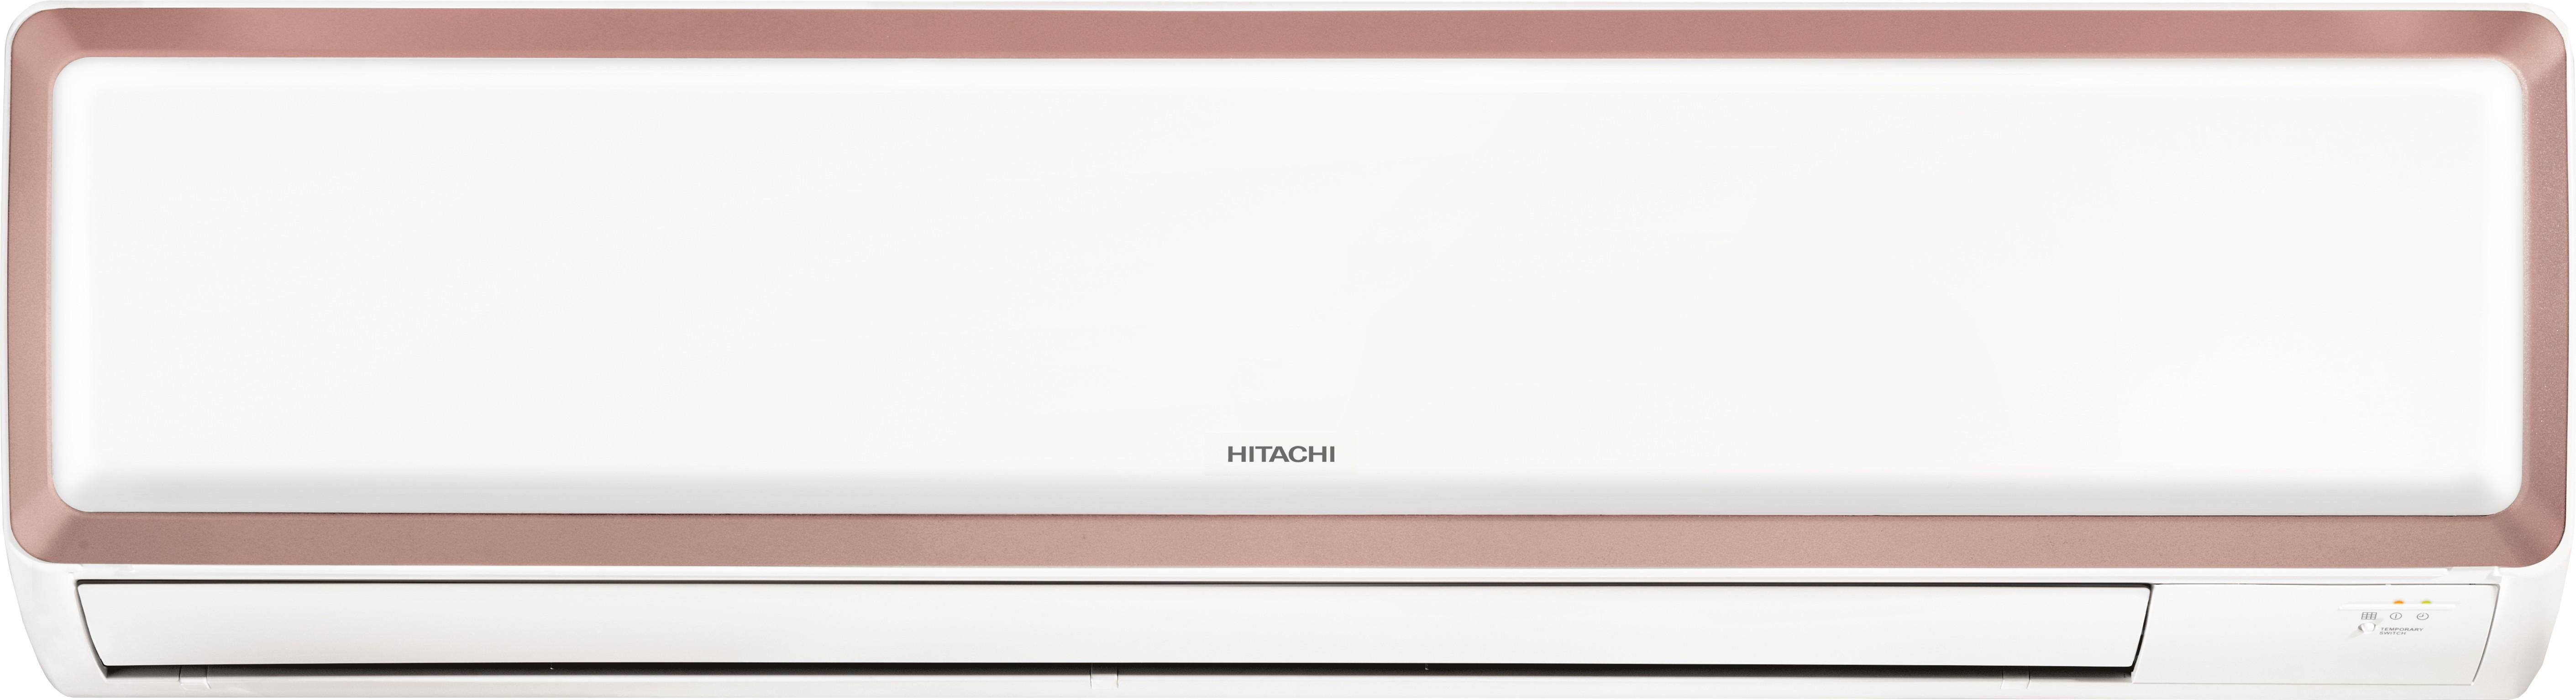 Hitachi 1 Tons 3 Star Split AC Copper (Hitachi)  Buy Online